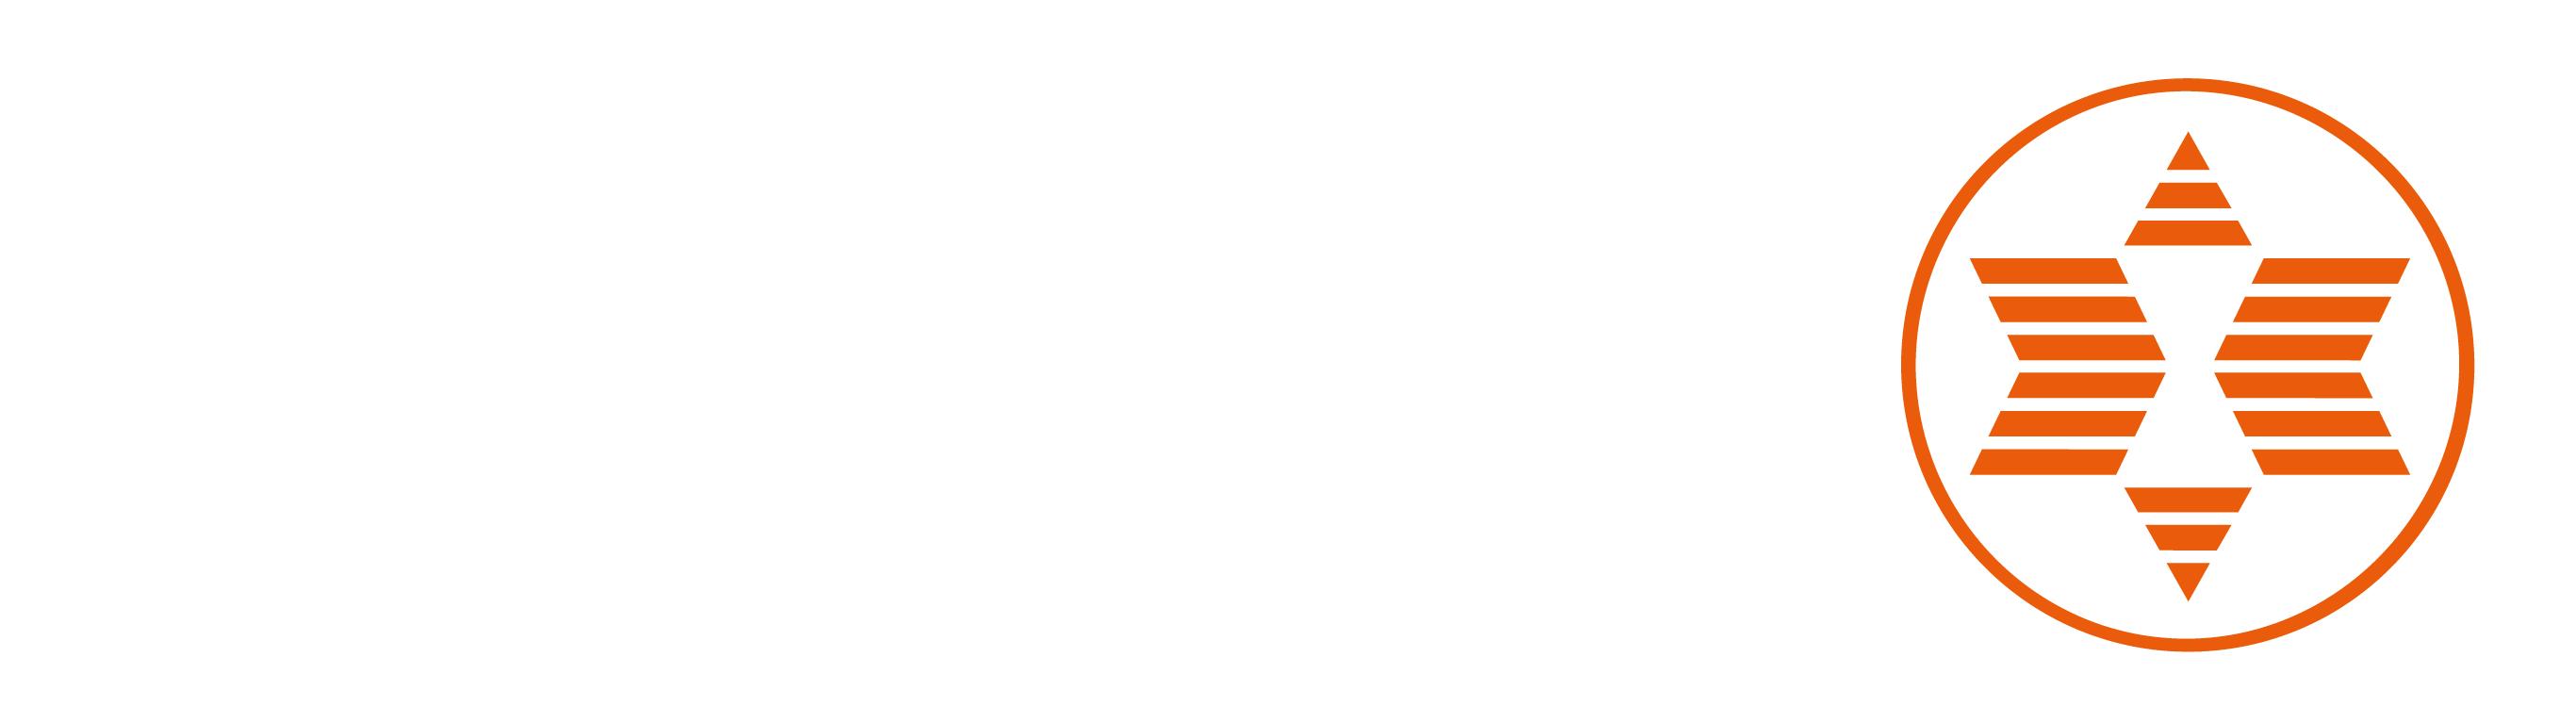 Exper Mallardo